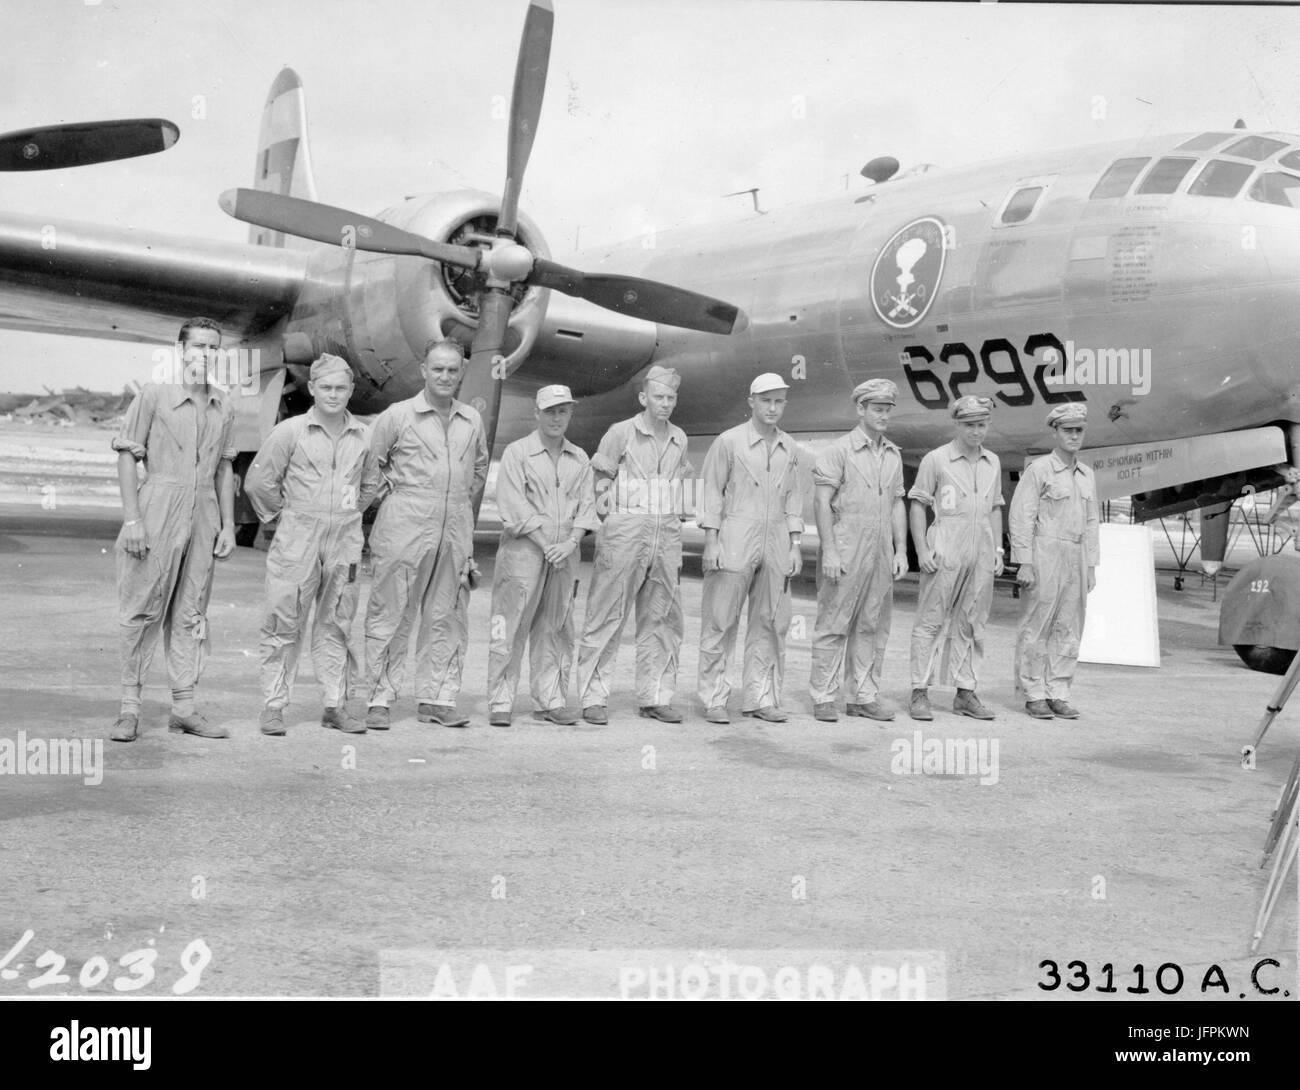 B 29 Crew Stock Photos \u0026 B 29 Crew Stock Images - Alamy